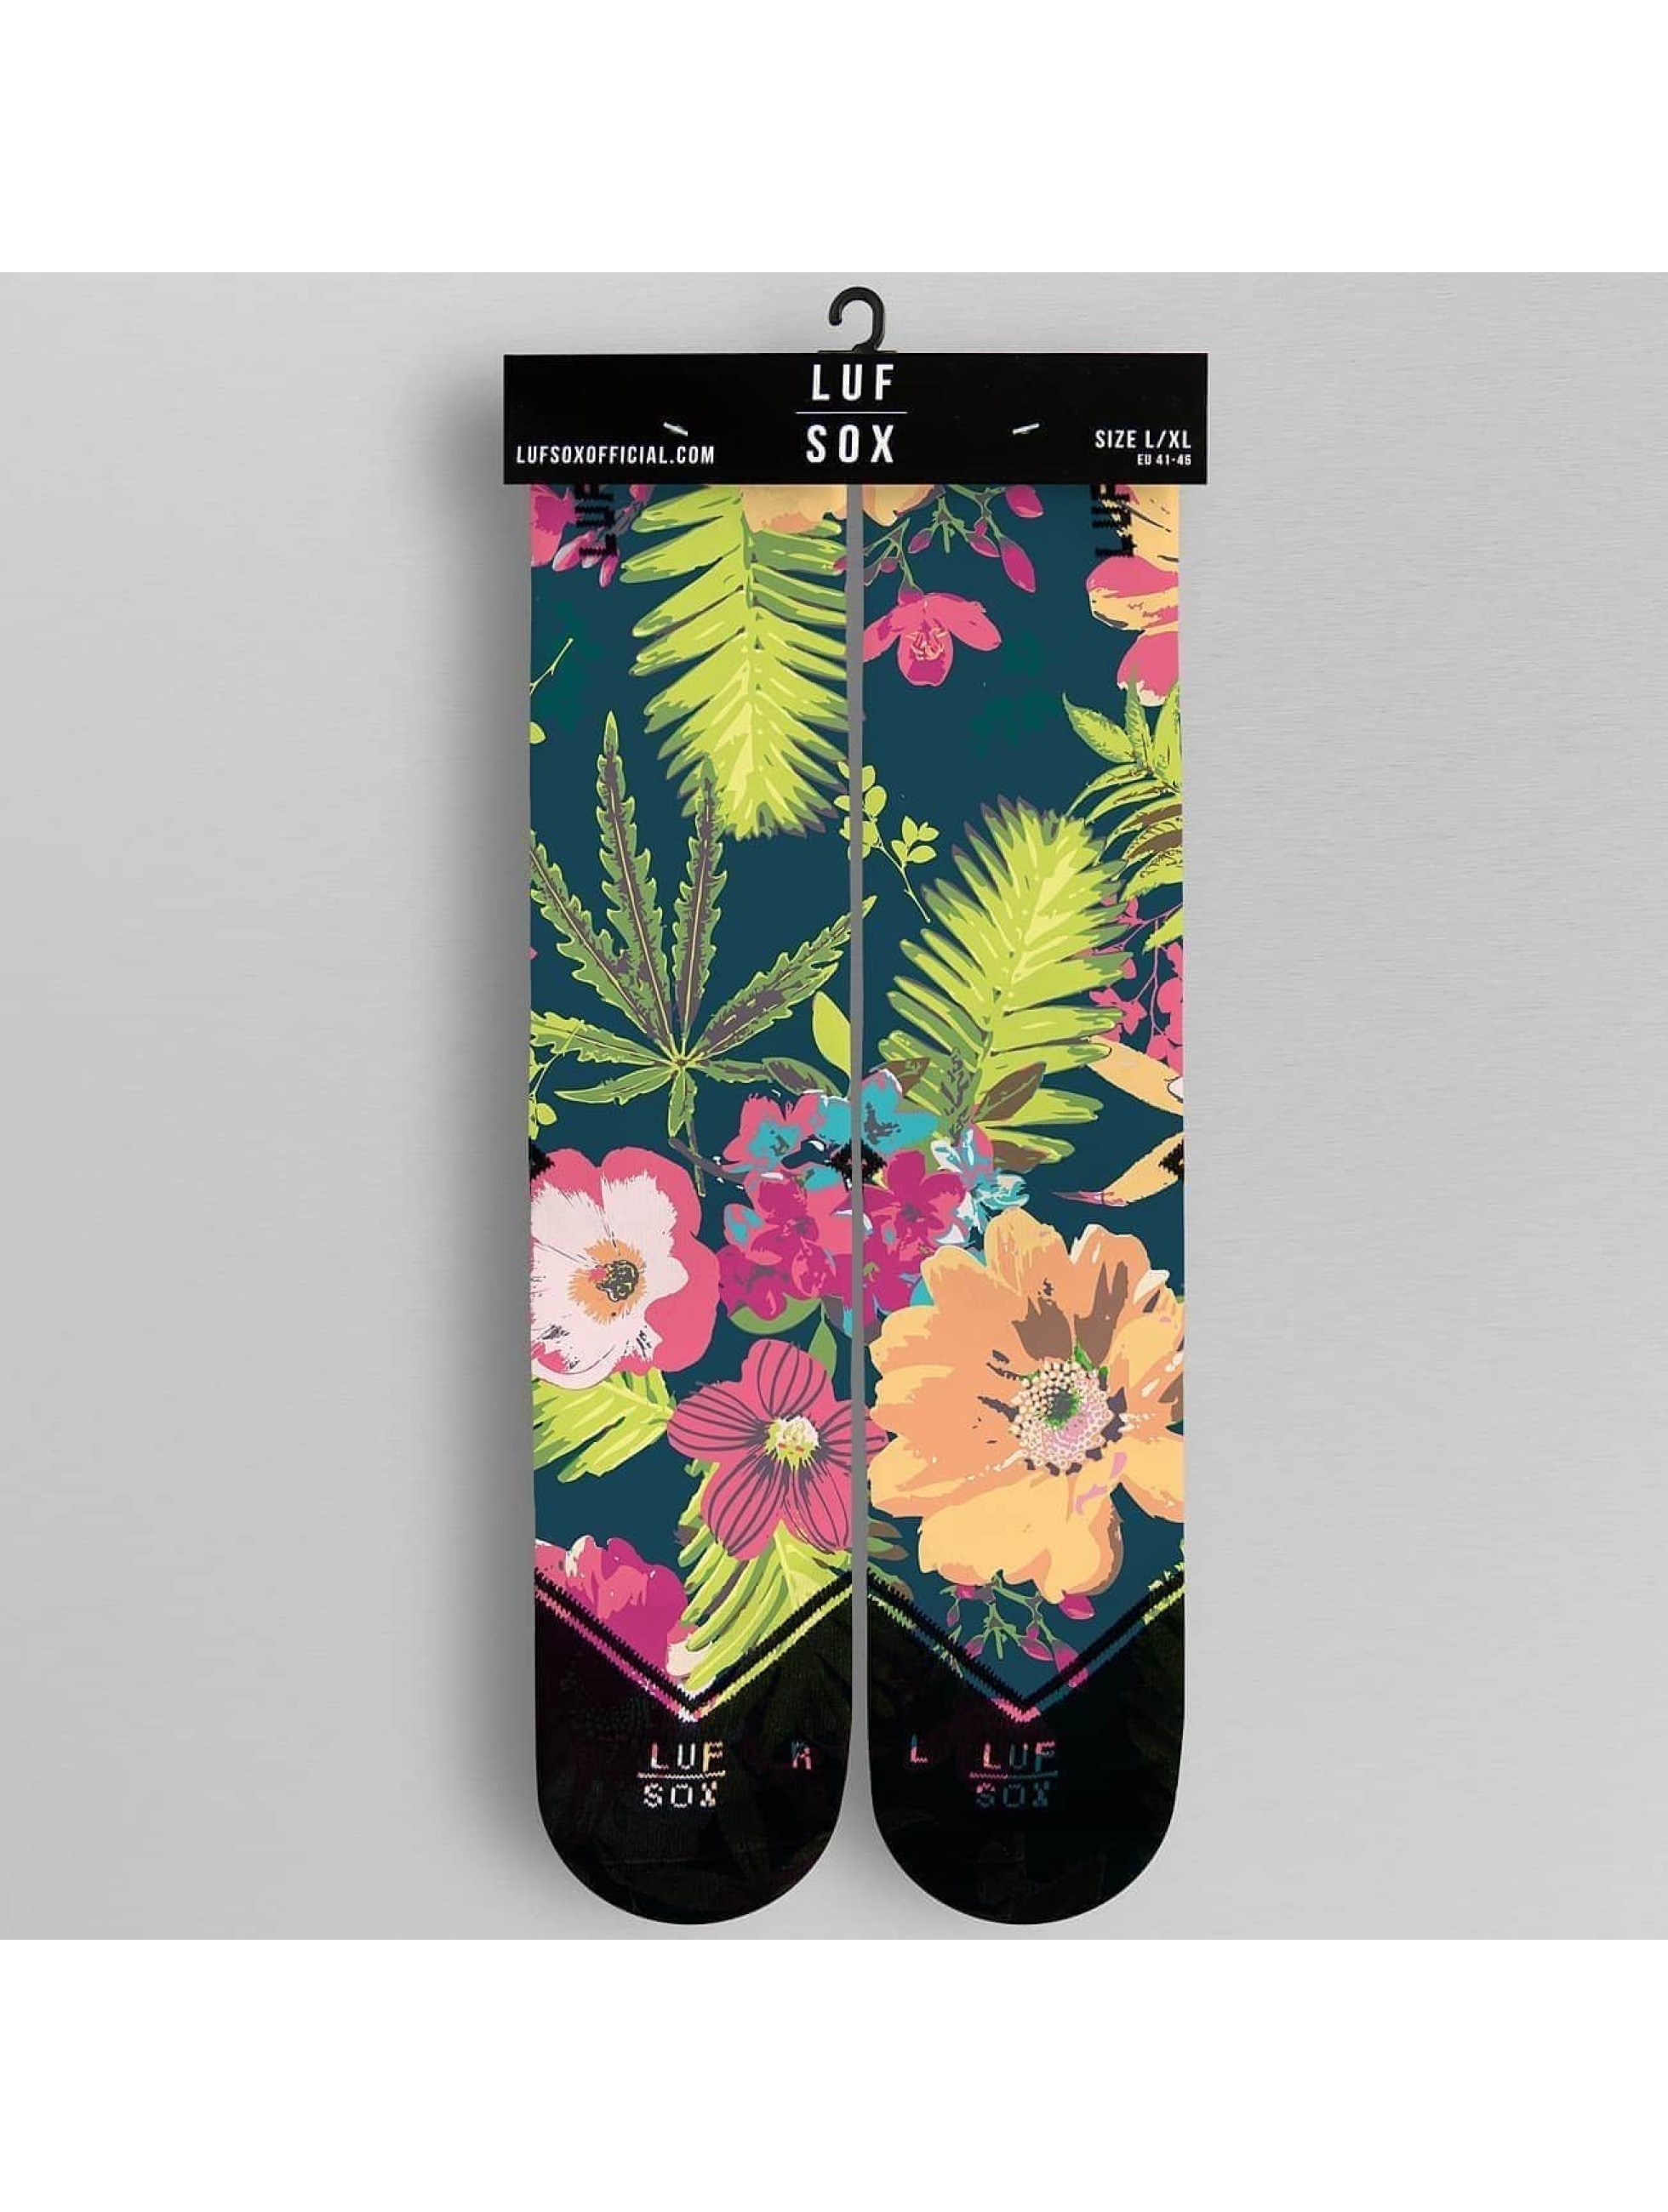 LUF SOX Skarpetki Tropic kolorowy